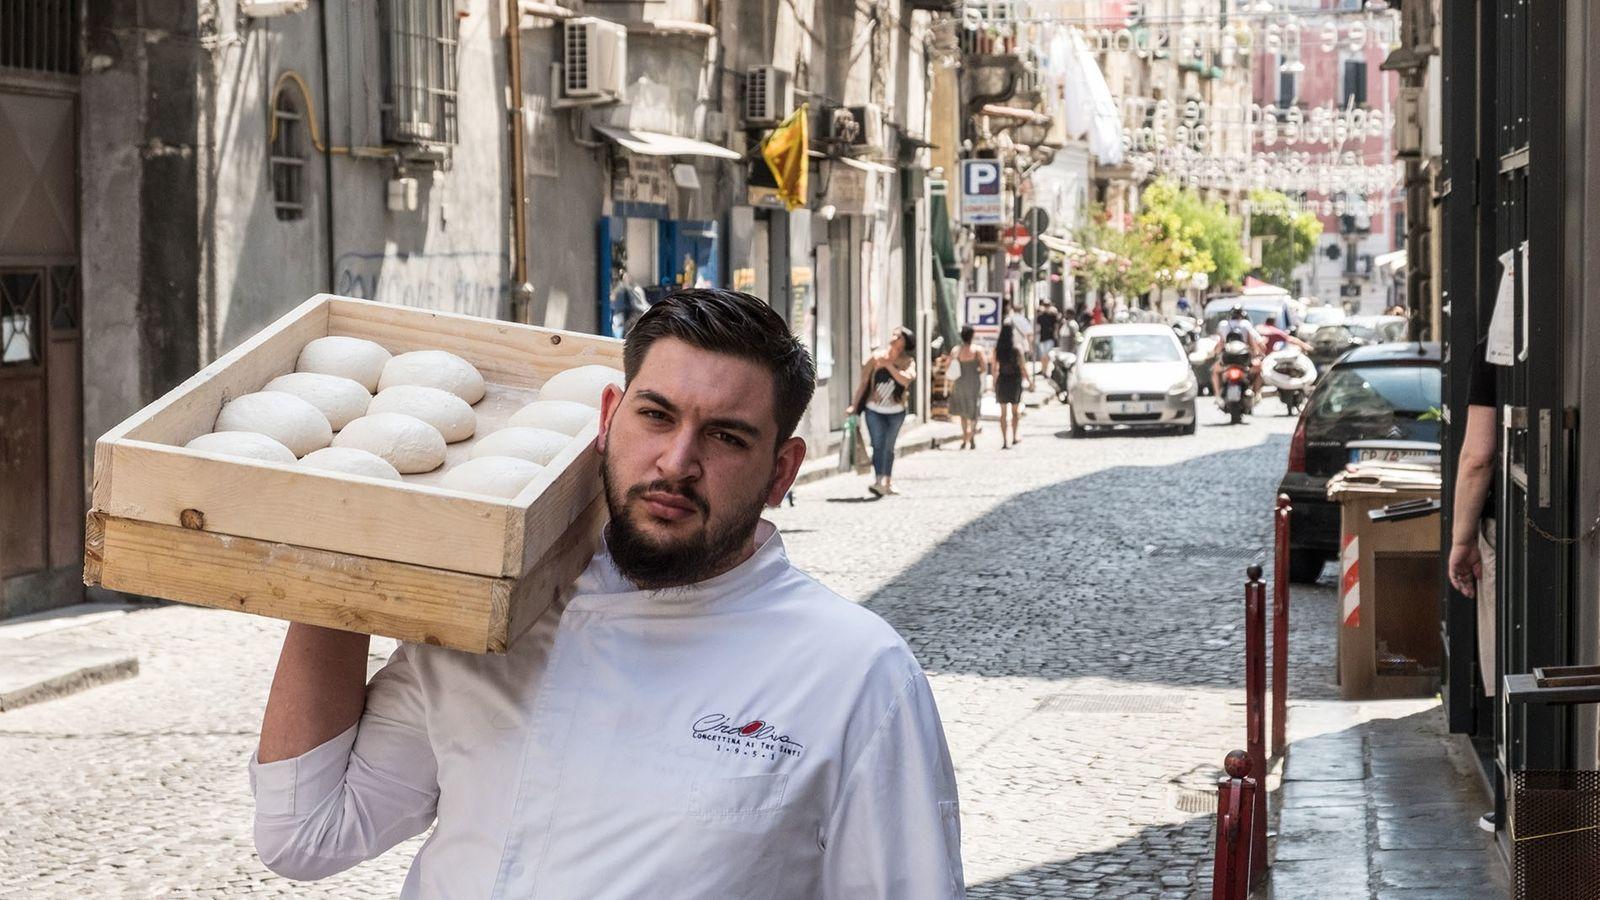 Pizza chef outside Concettina ai Tre Santi pizzeria with a tray of dough.